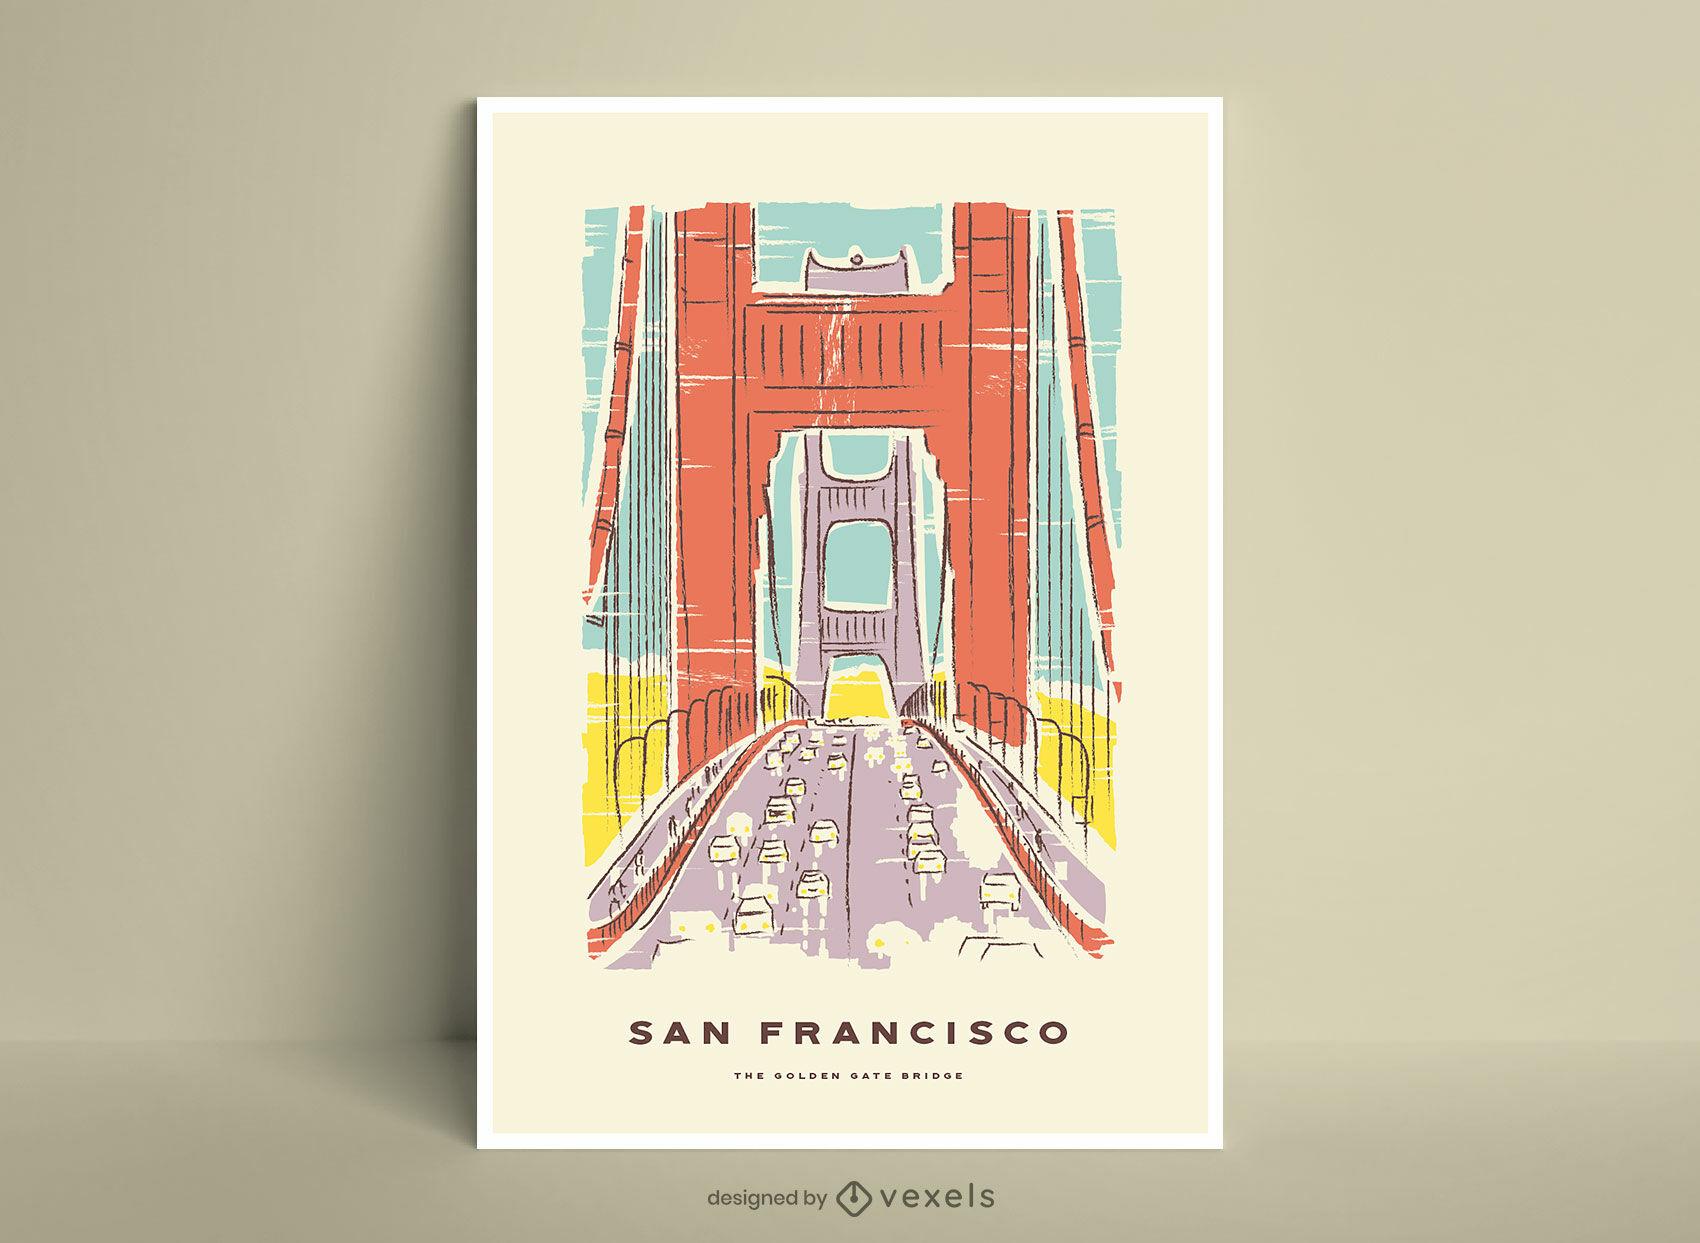 P?ster puente golden gate San Francisco